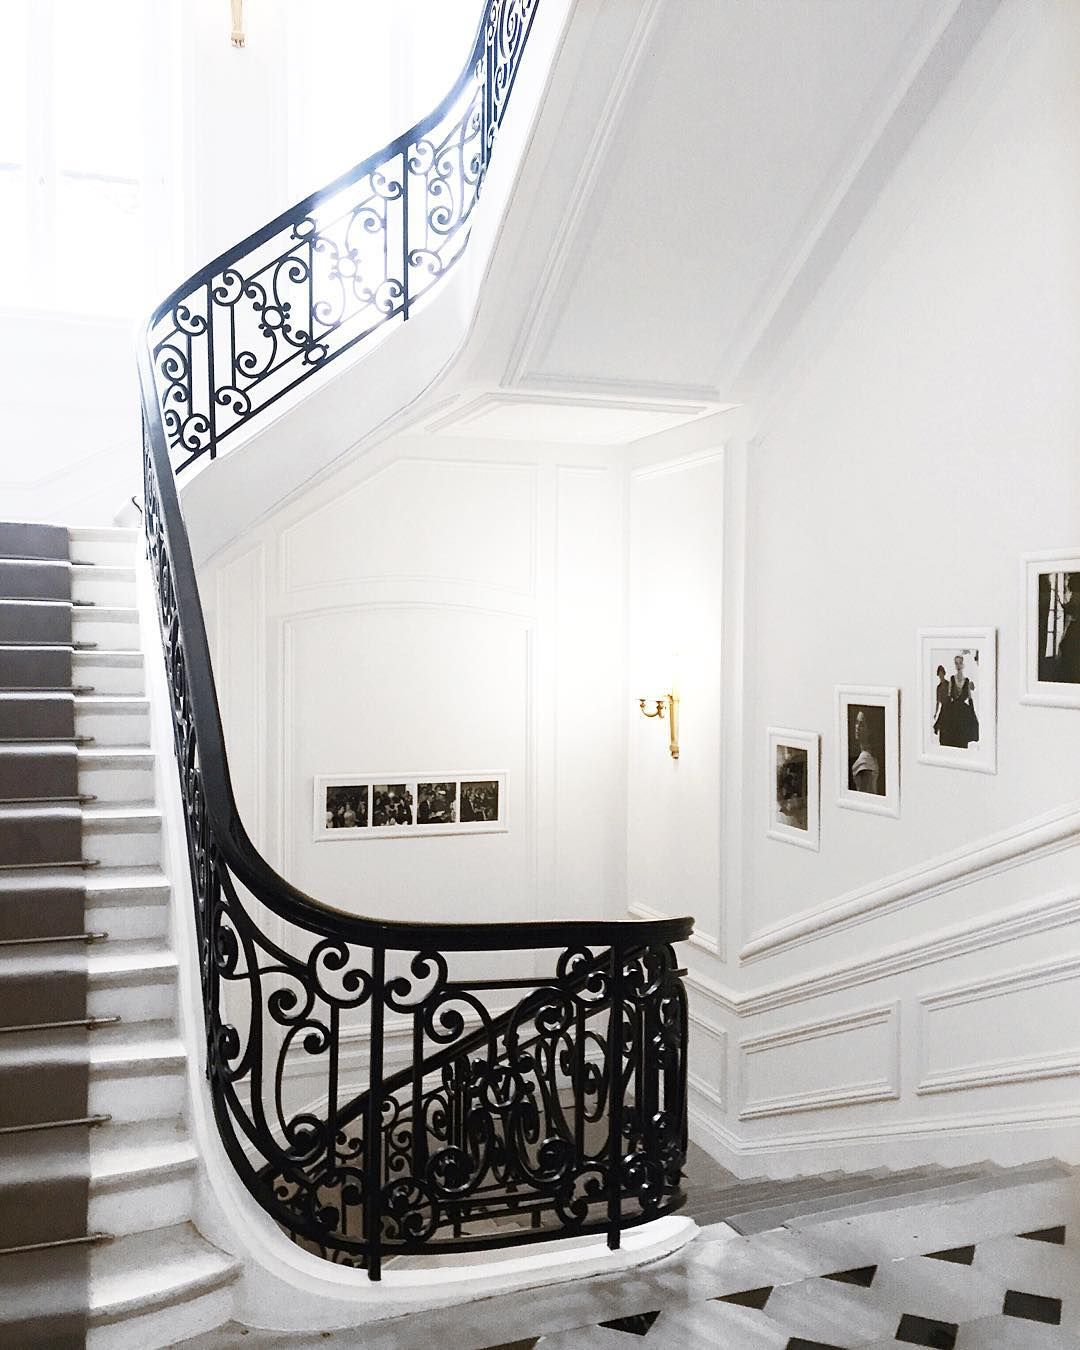 London Apartments Exterior: 14.9k Likes, 89 Comments